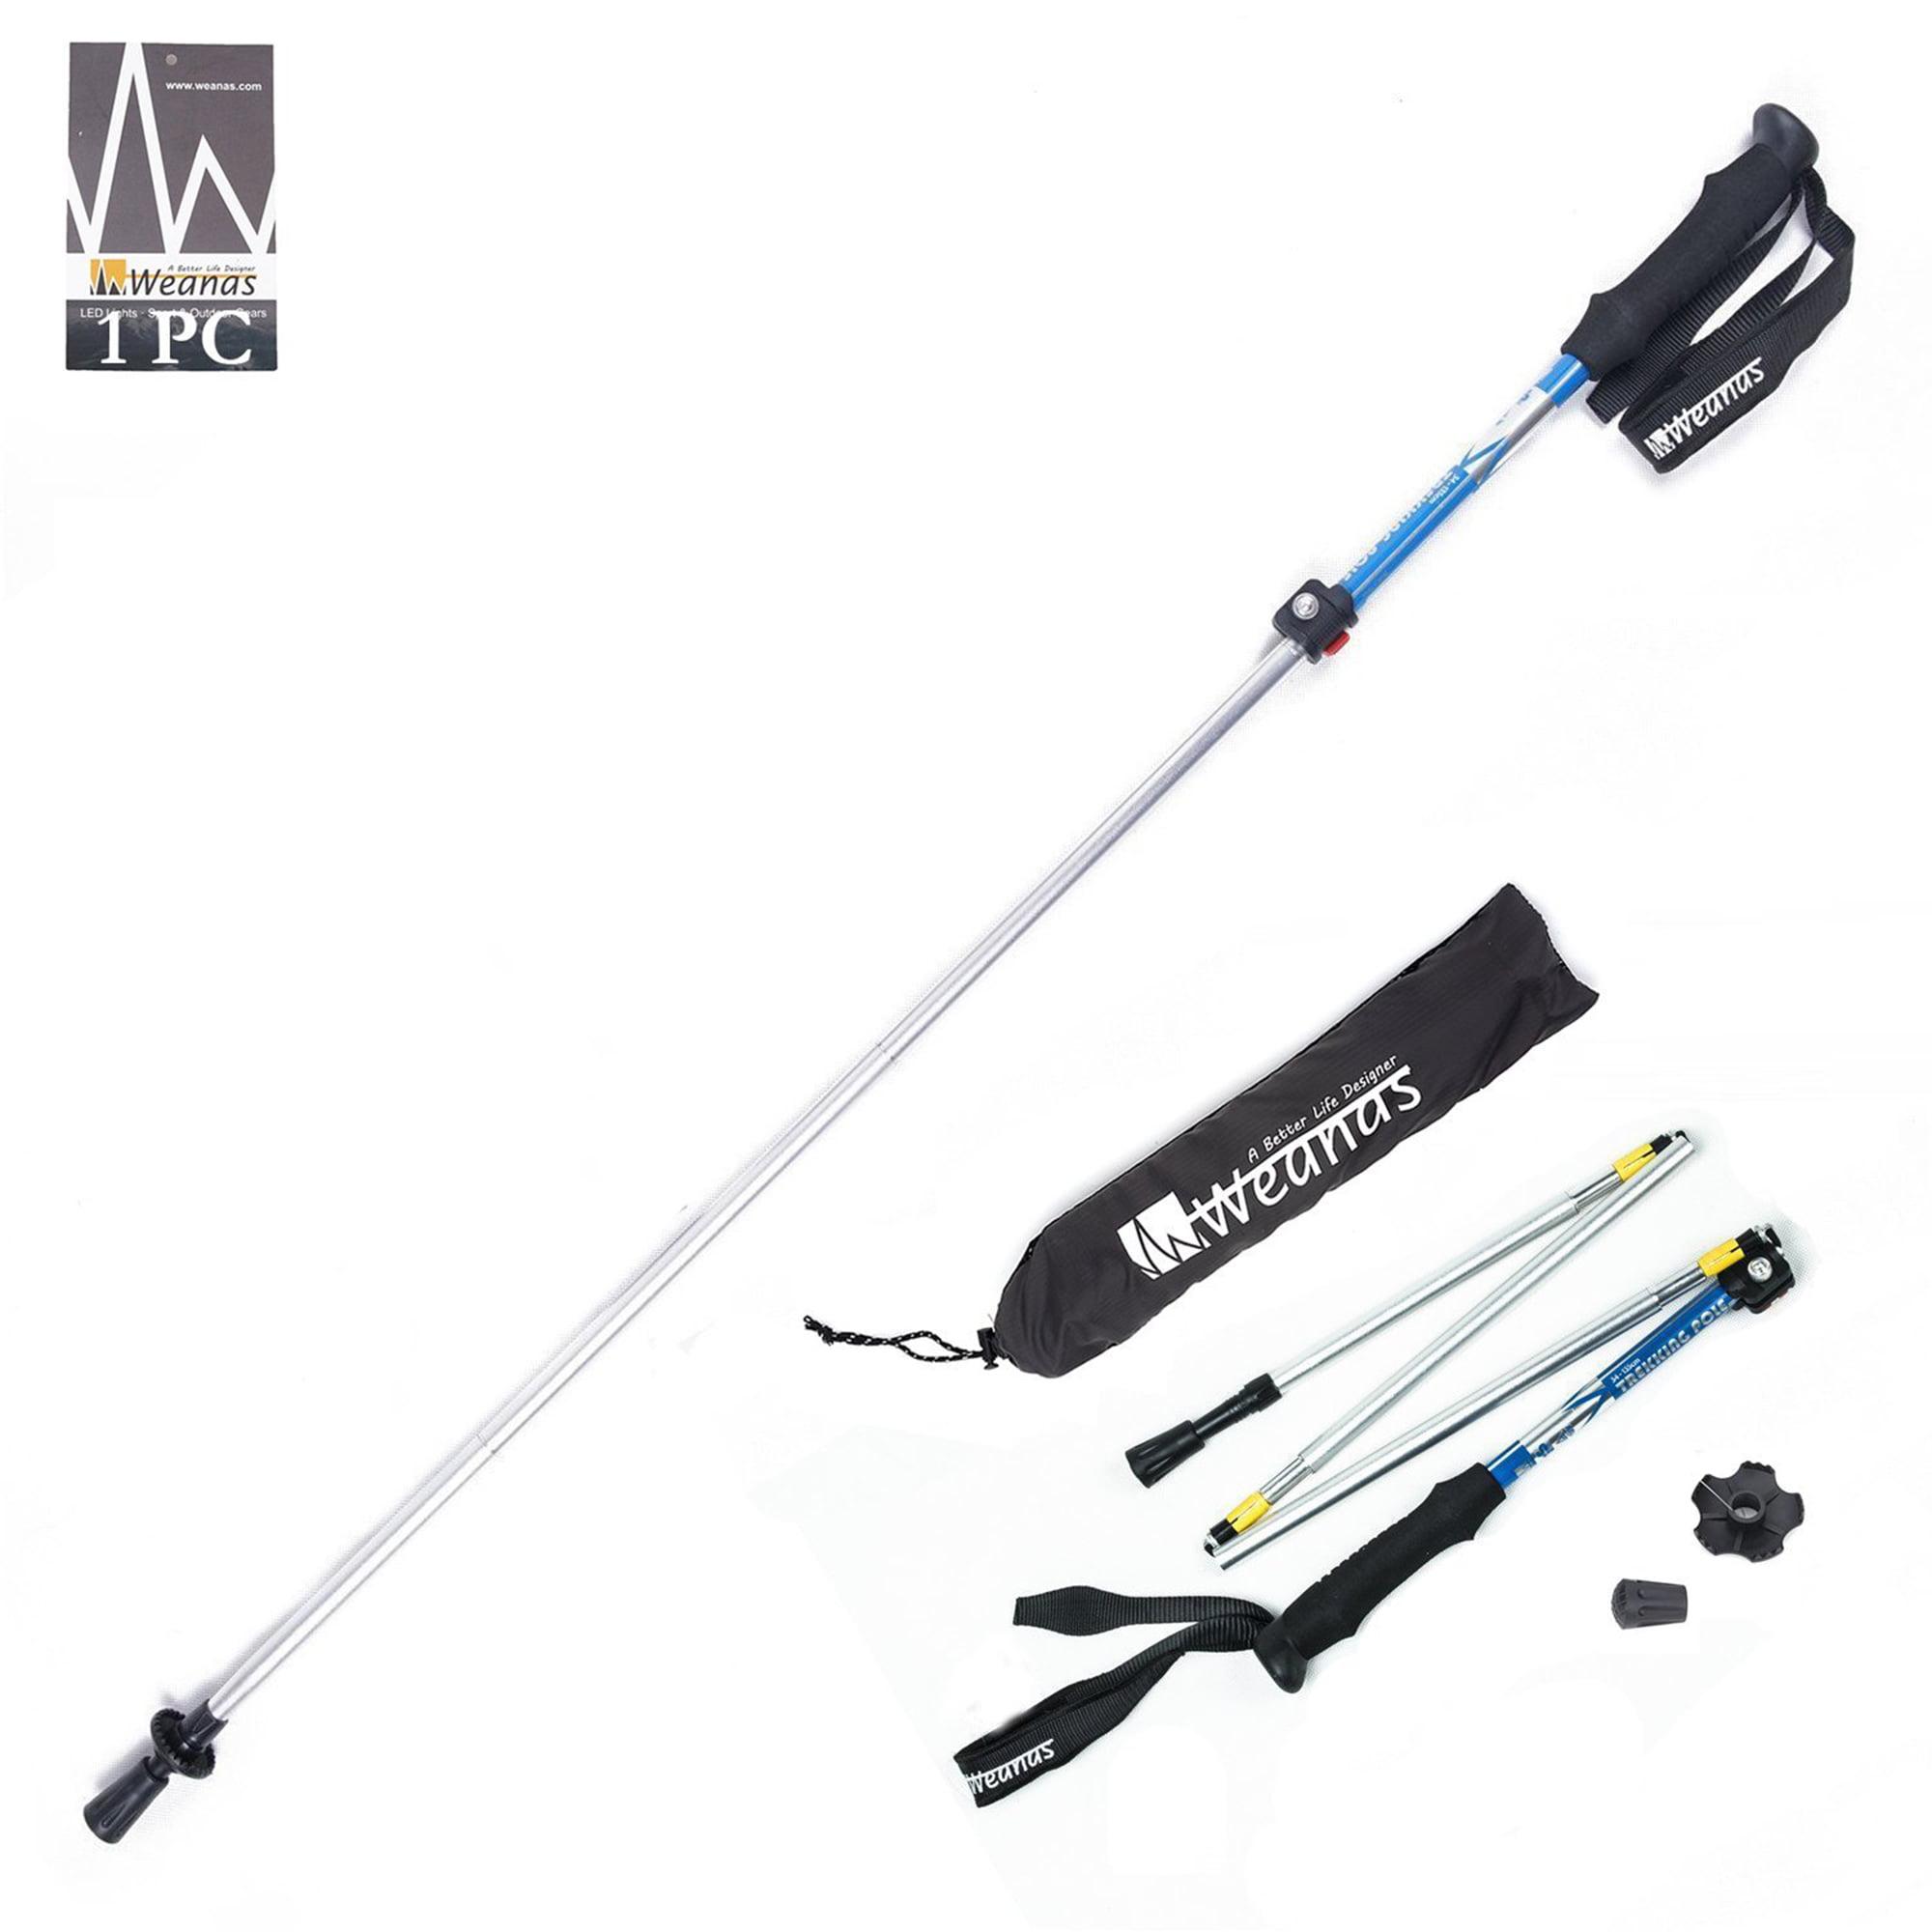 WEANAS Folding Collapsible Trekking Pole Climbing Stick with EVA Foam Handle, Ultralight Adjustable Alpenstocks,Travel... by Weanas